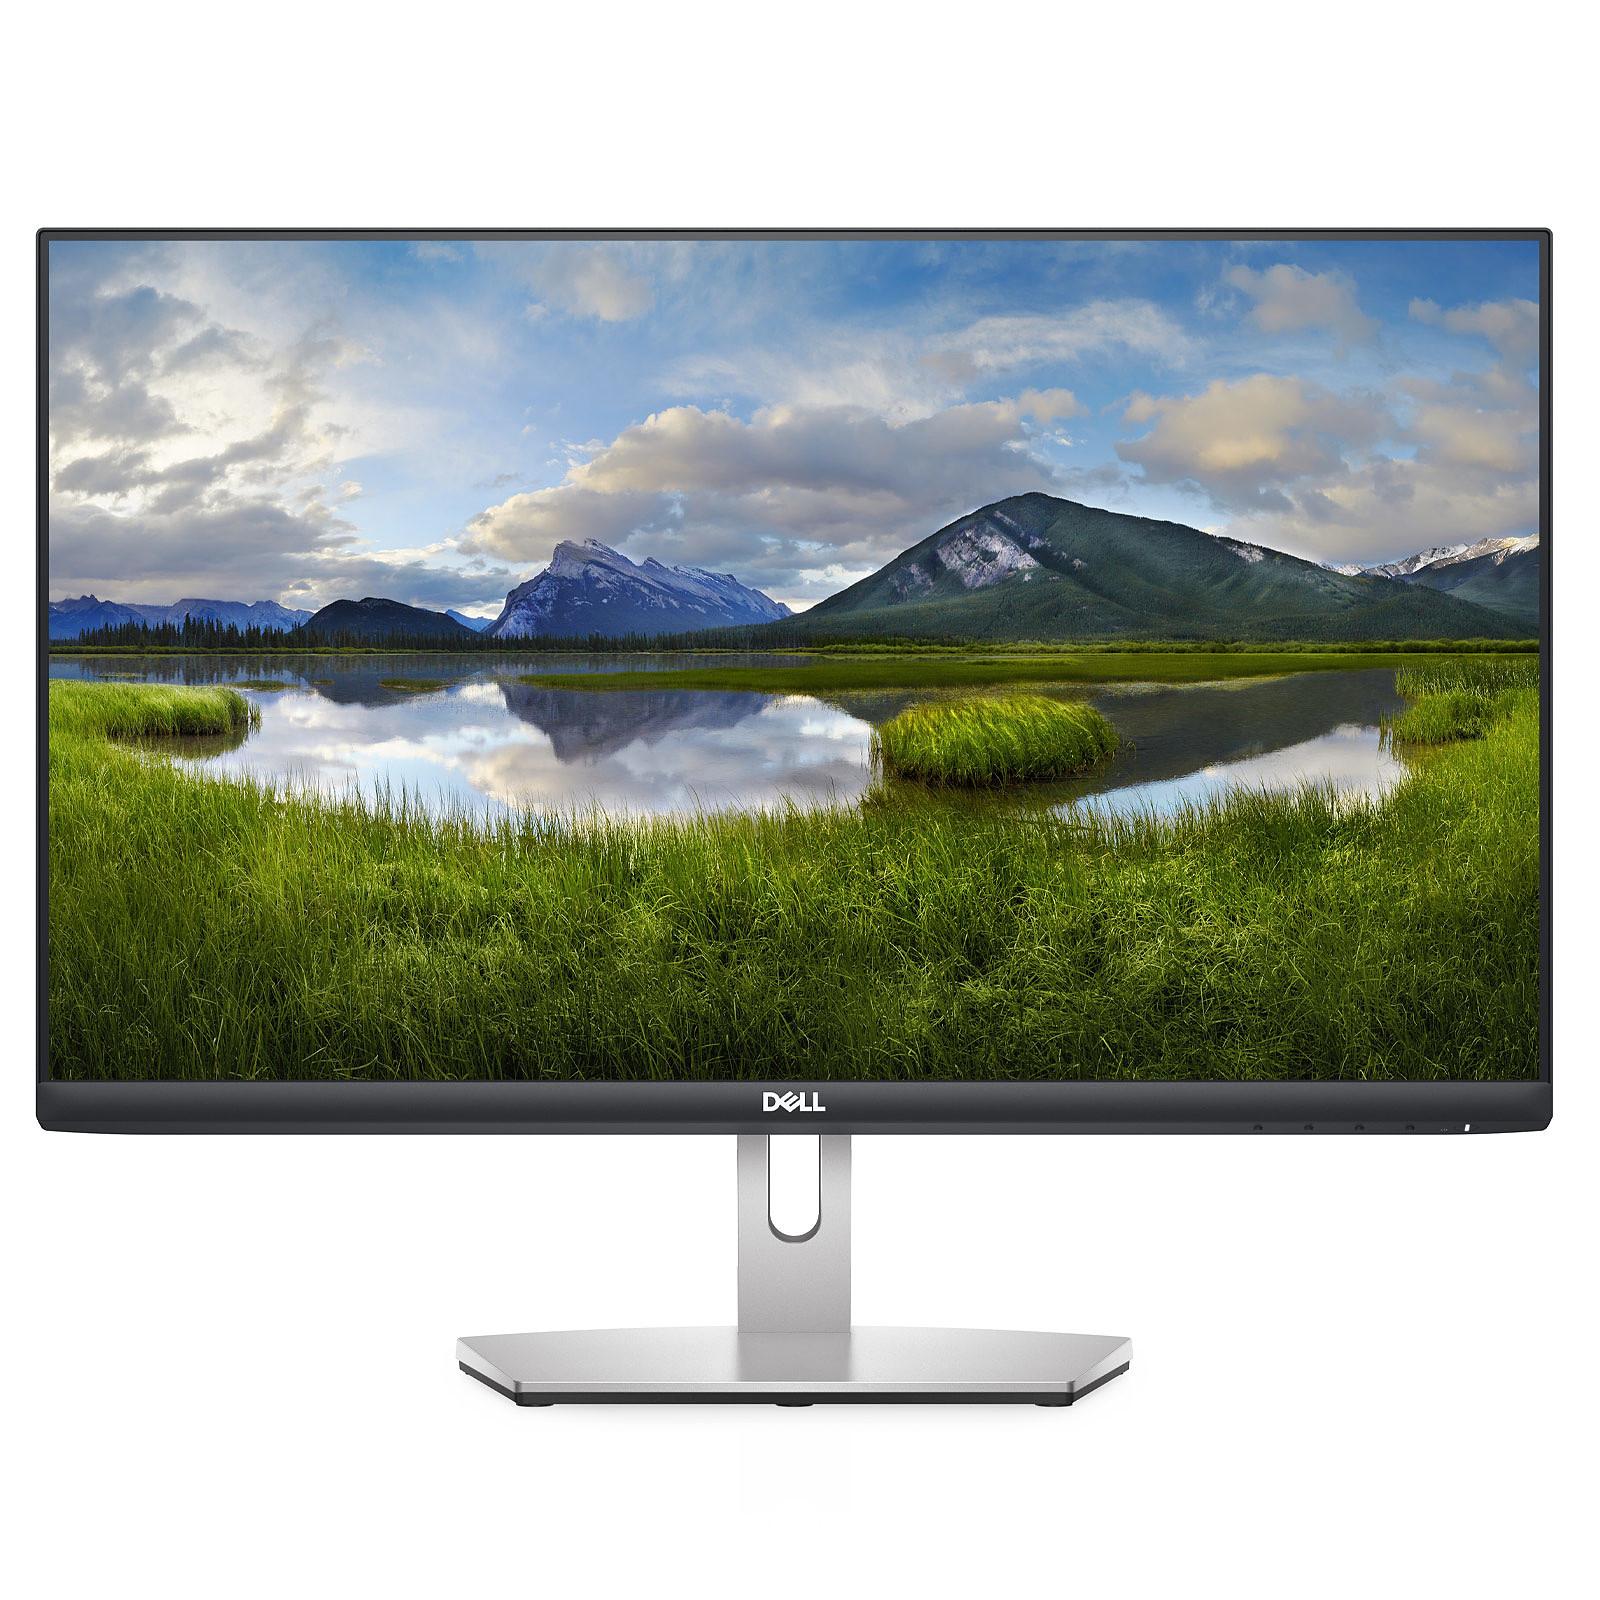 "Ecran PC 24"" Dell S2421HN - Full HD, Dalle IPS, 75 Hz, 4 ms"